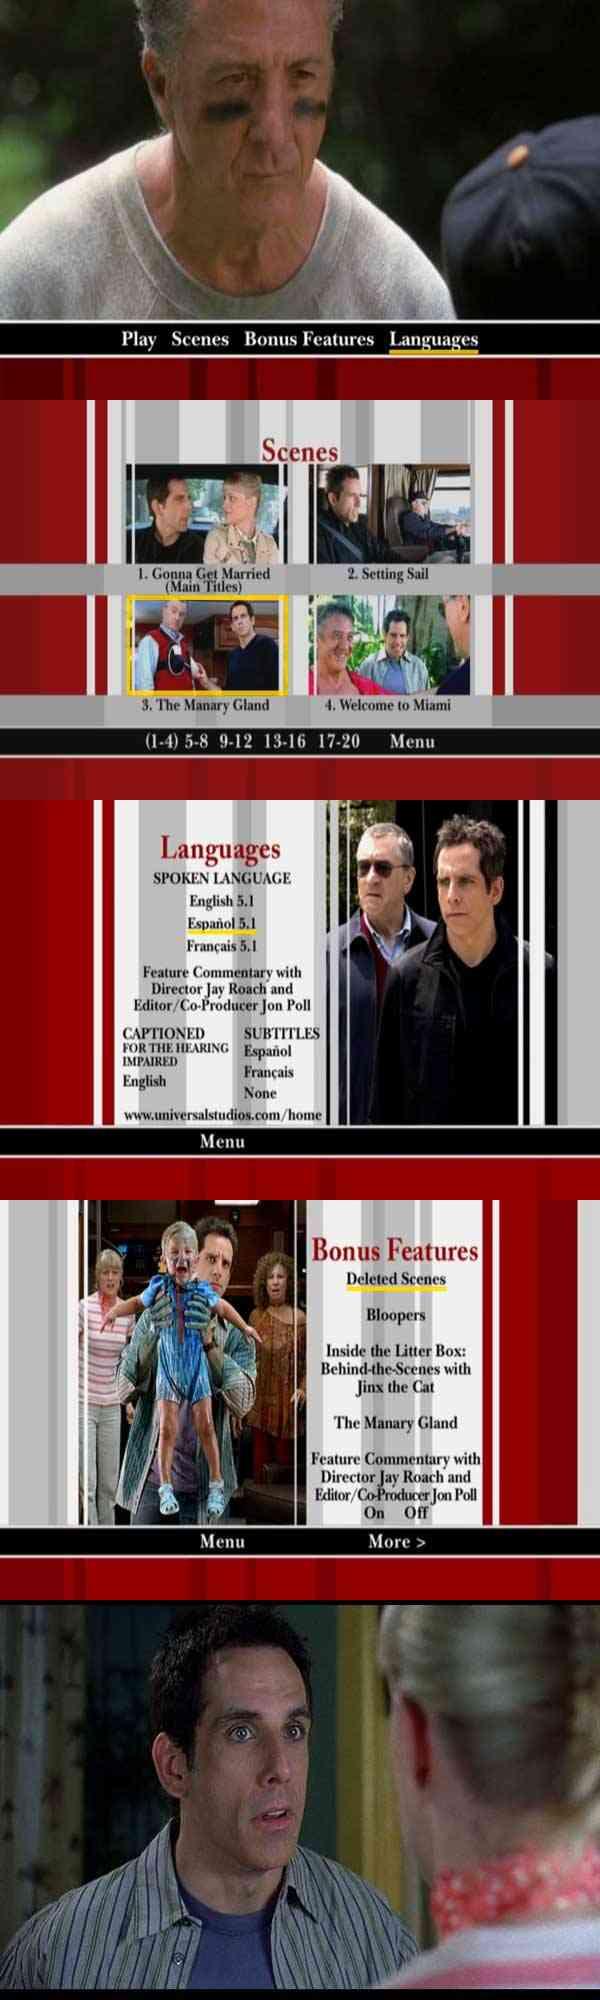 meet the fockers online subtitulada espanol